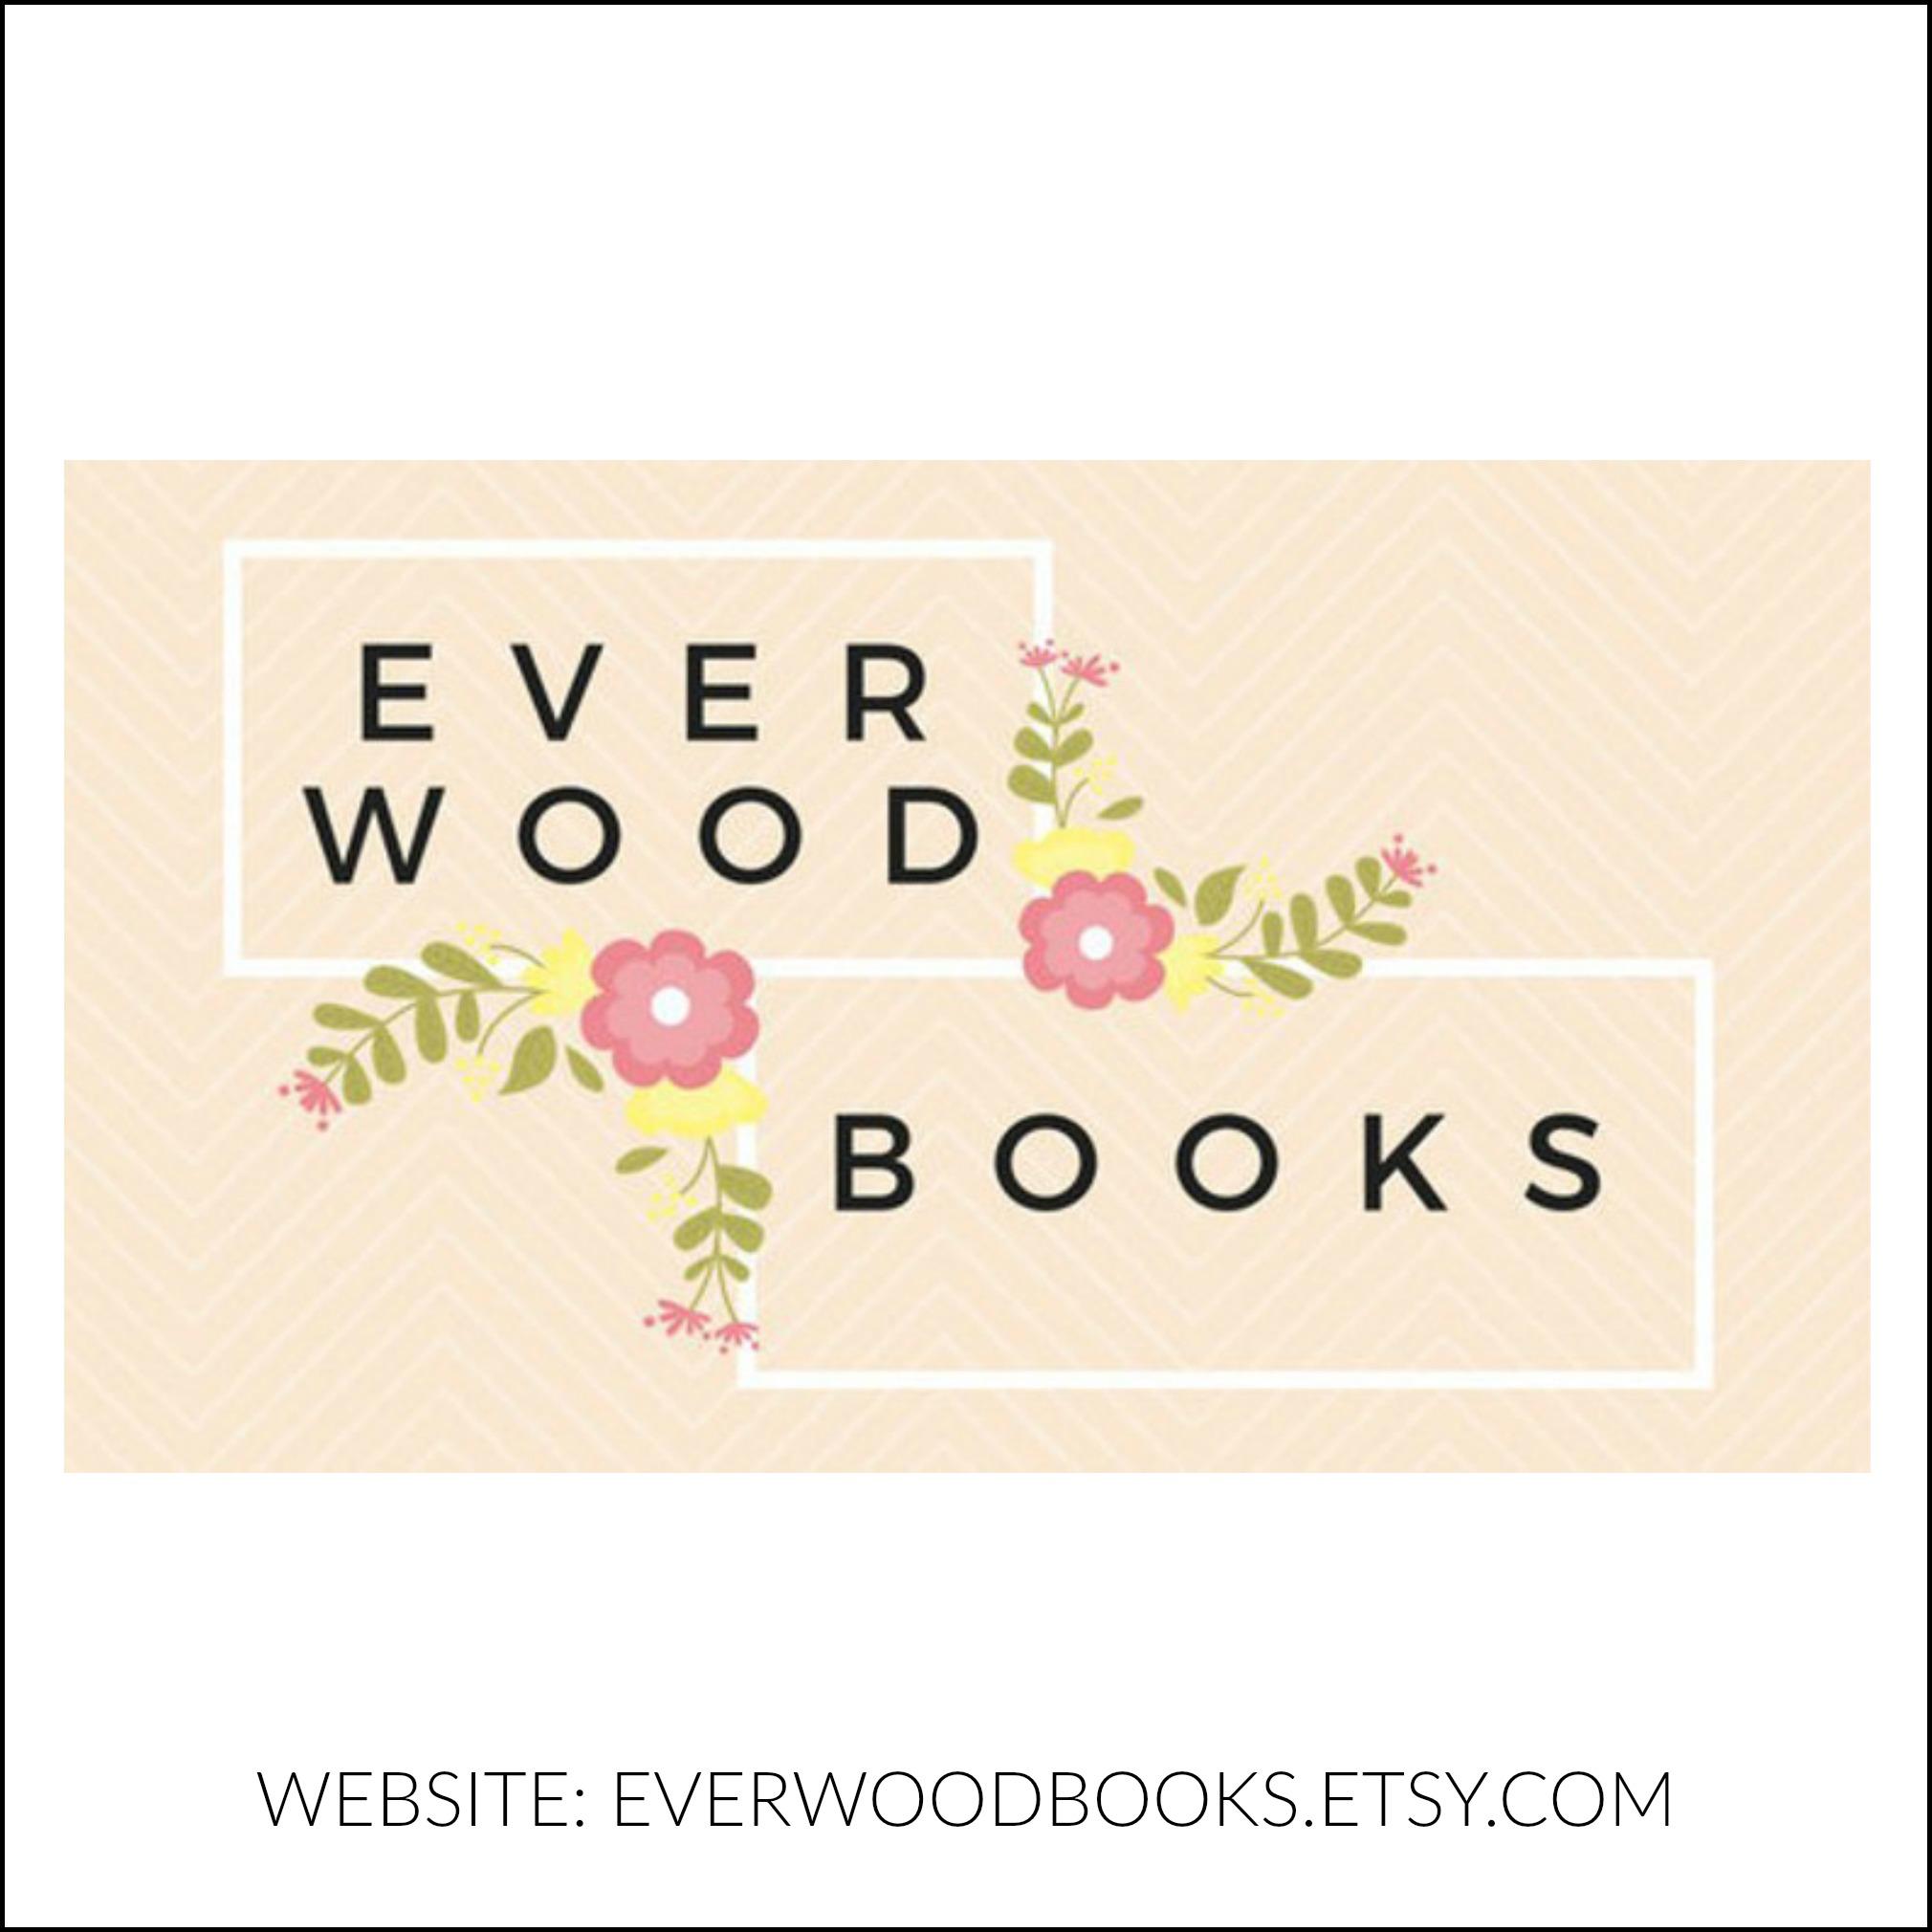 Everwood Books | EVERWOODBOOKS.ETSY.COM